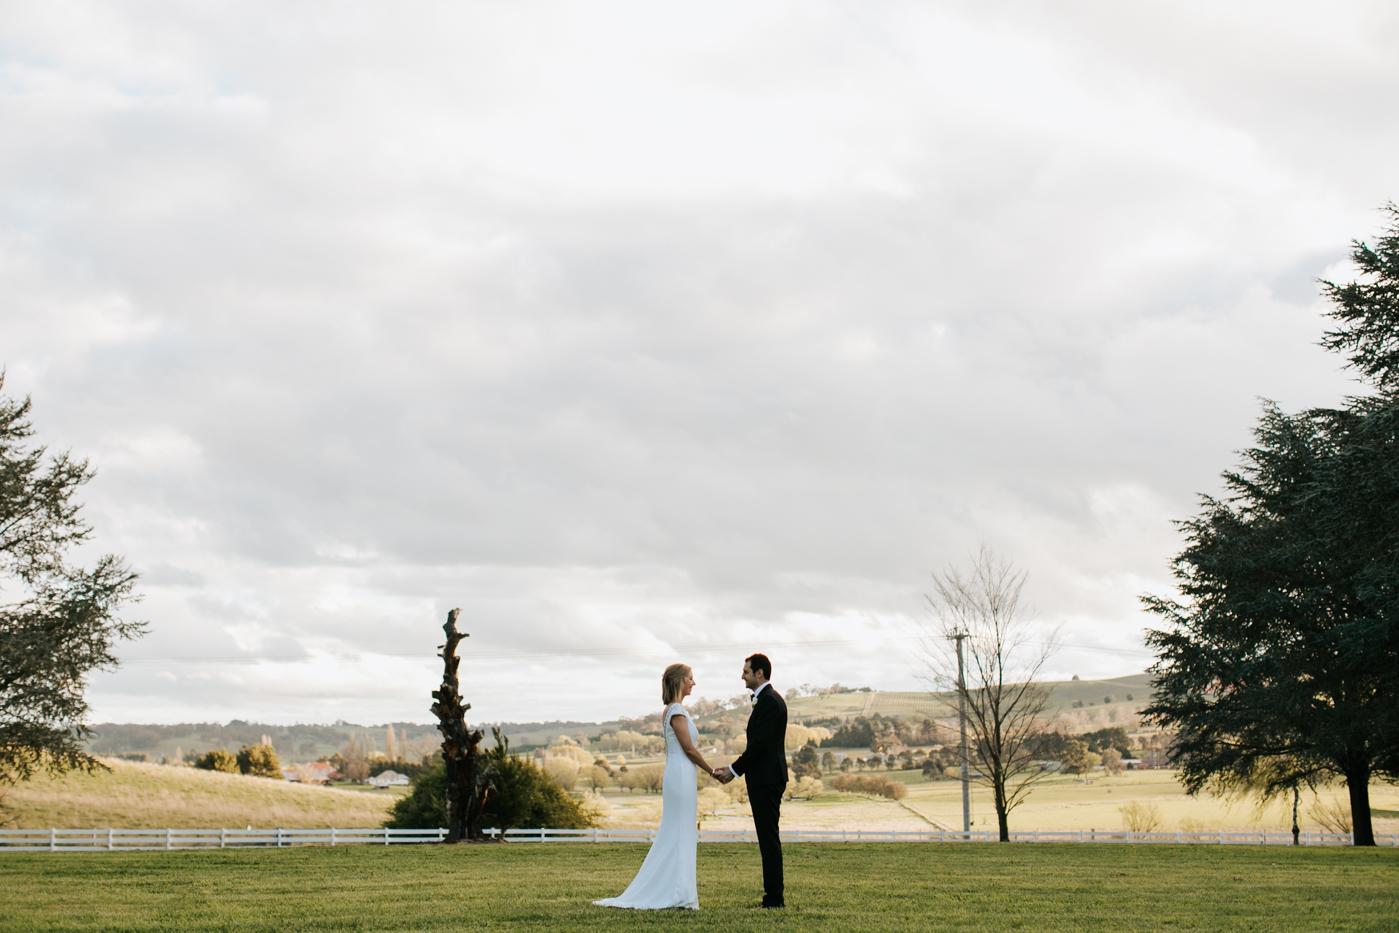 Bridget & James - Orange Country Wedding - Samantha Heather Photography-150.jpg